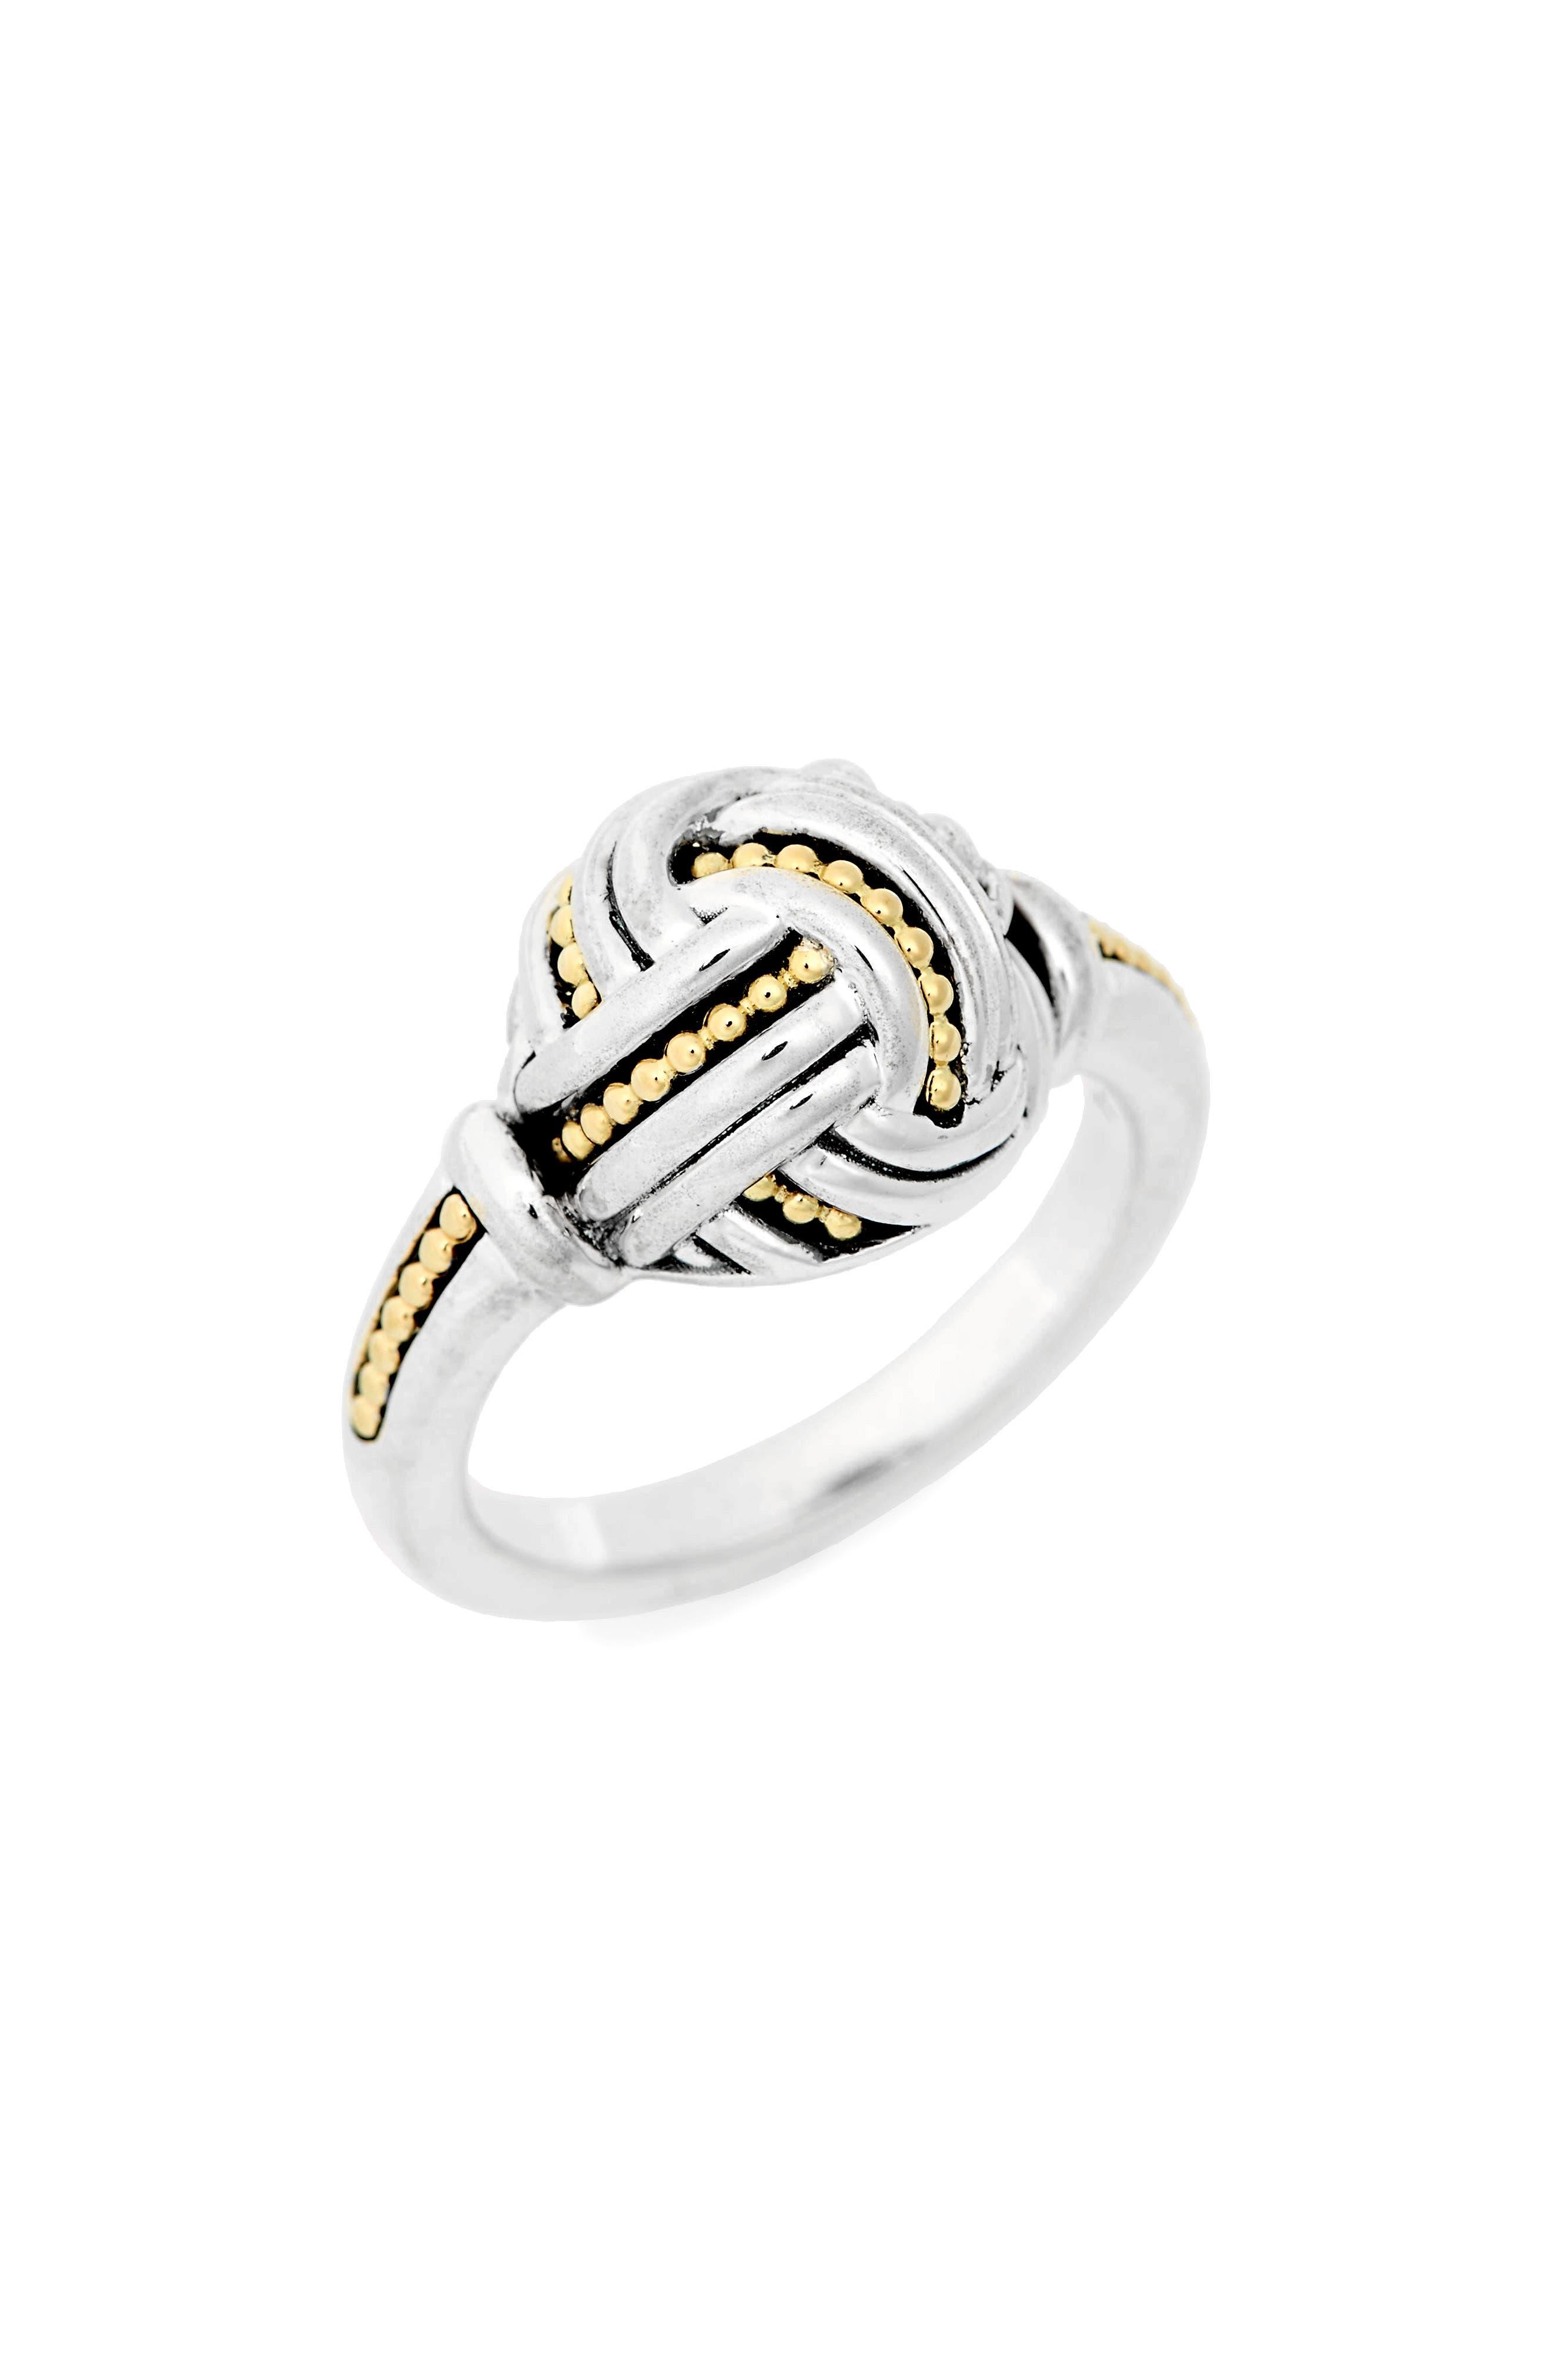 LAGOS Small Round Ring